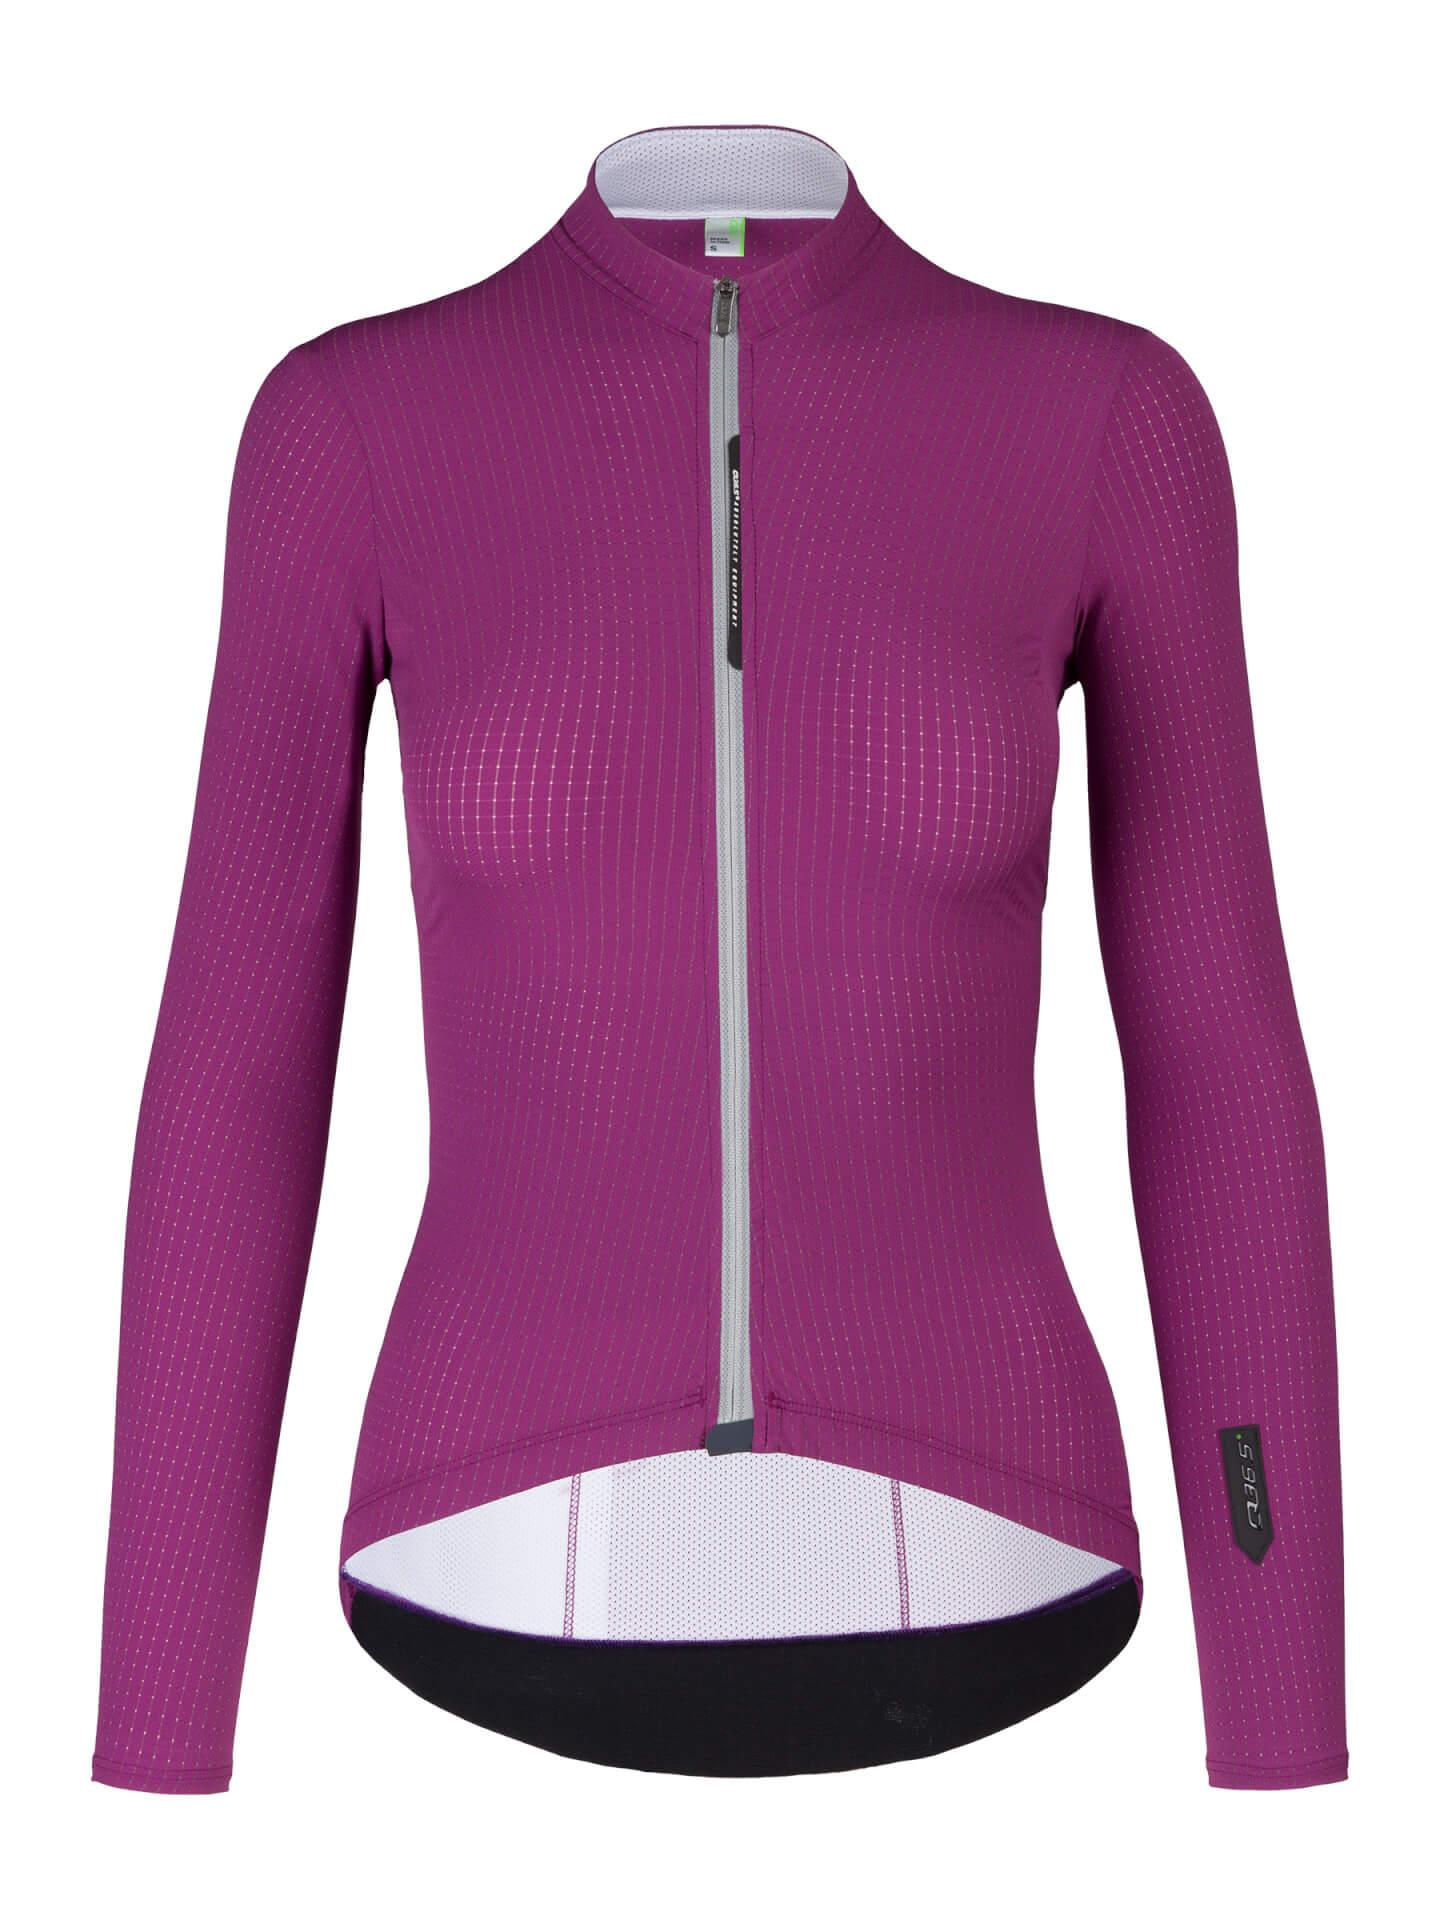 womens-cycling-jersey-pinstripe-x-purple-027x.11